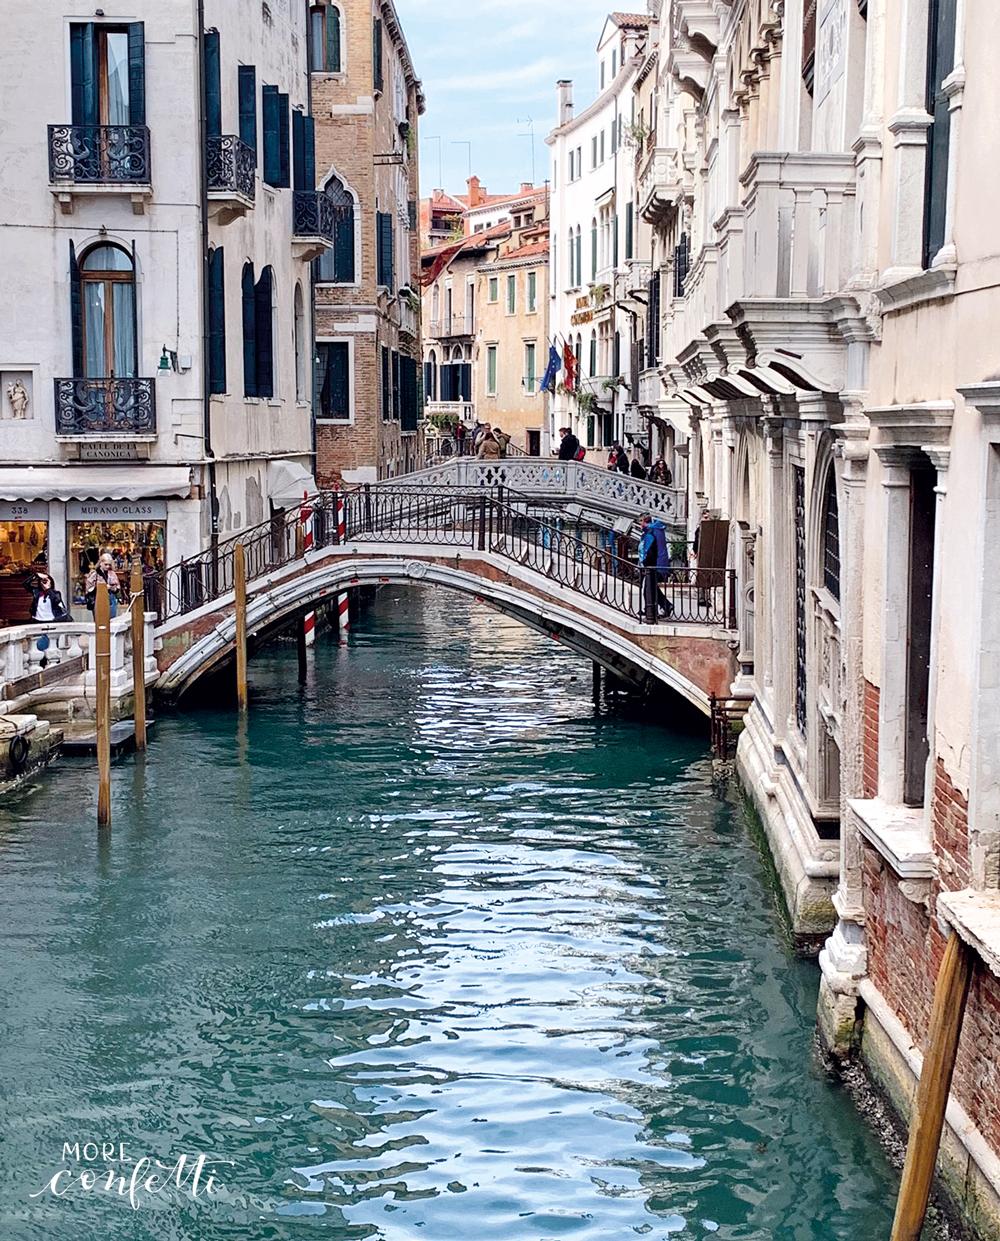 Venedig für Anfänger - moreconfetti